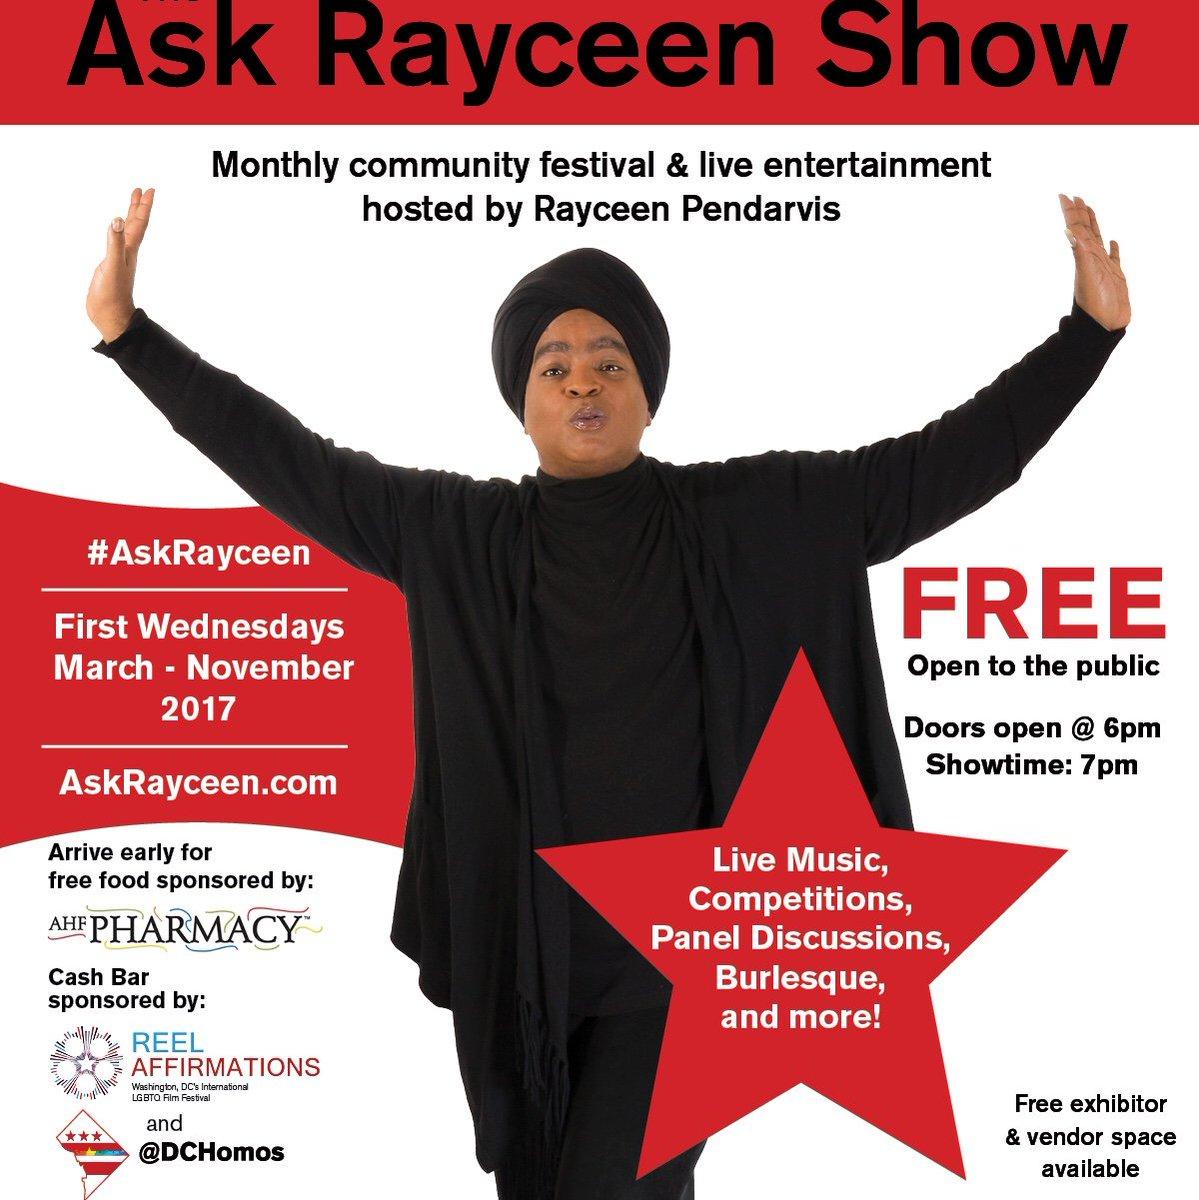 #imthankful4 @AskRayceen Show (Oct 4) contestants, volunteers and attendees! @RayceenHRH @TeamRayceen #HRCequalityCenter #DCevent #ZONEMD<br>http://pic.twitter.com/b9YbcPdeOF